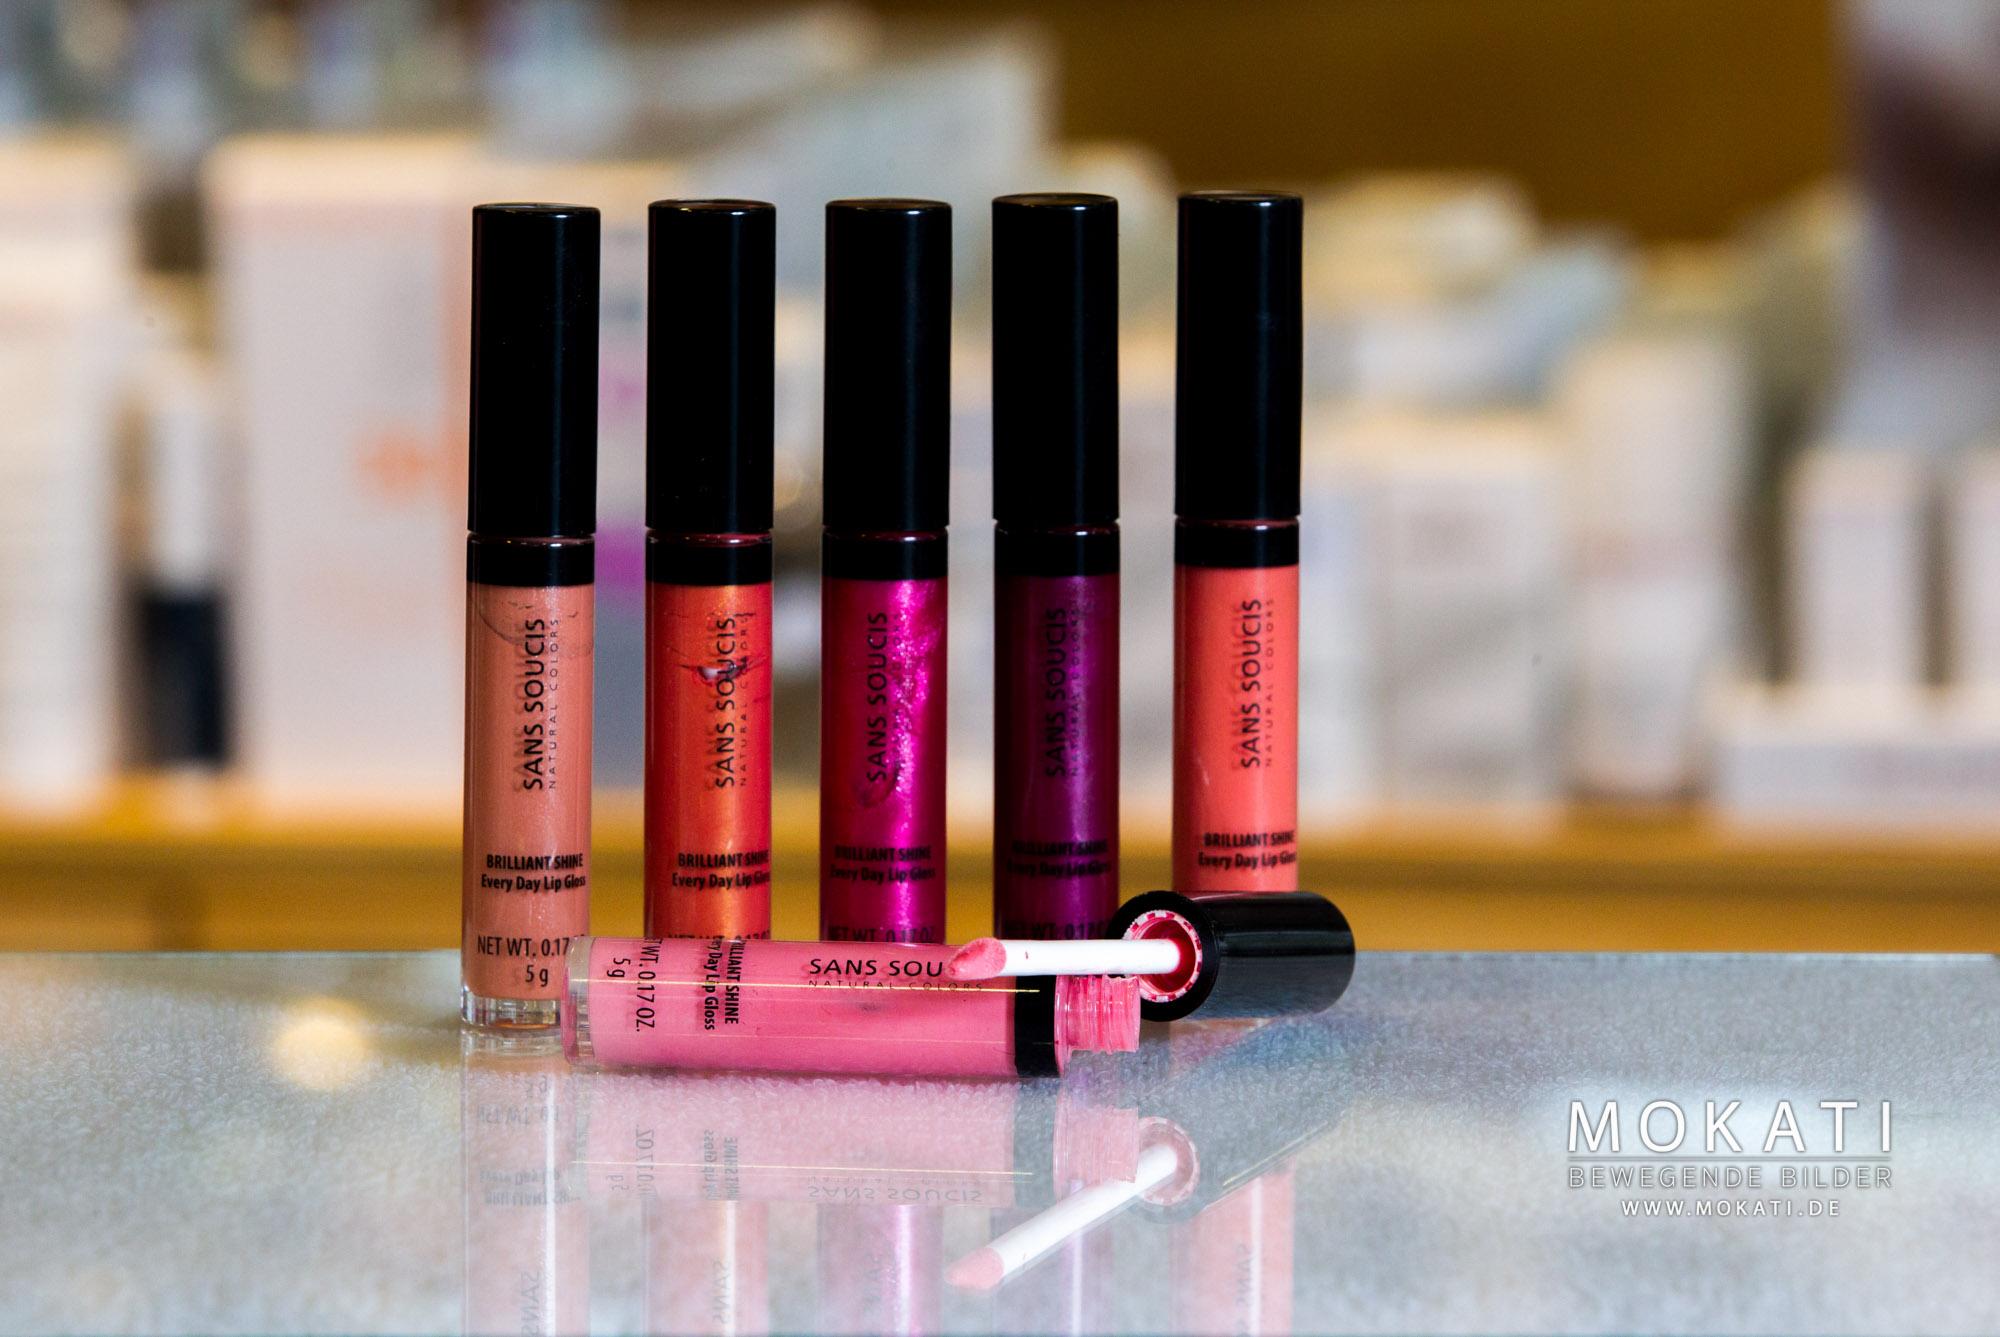 Redröh Kosmetikstudio Lipgloss Aktion von Sans Soucis